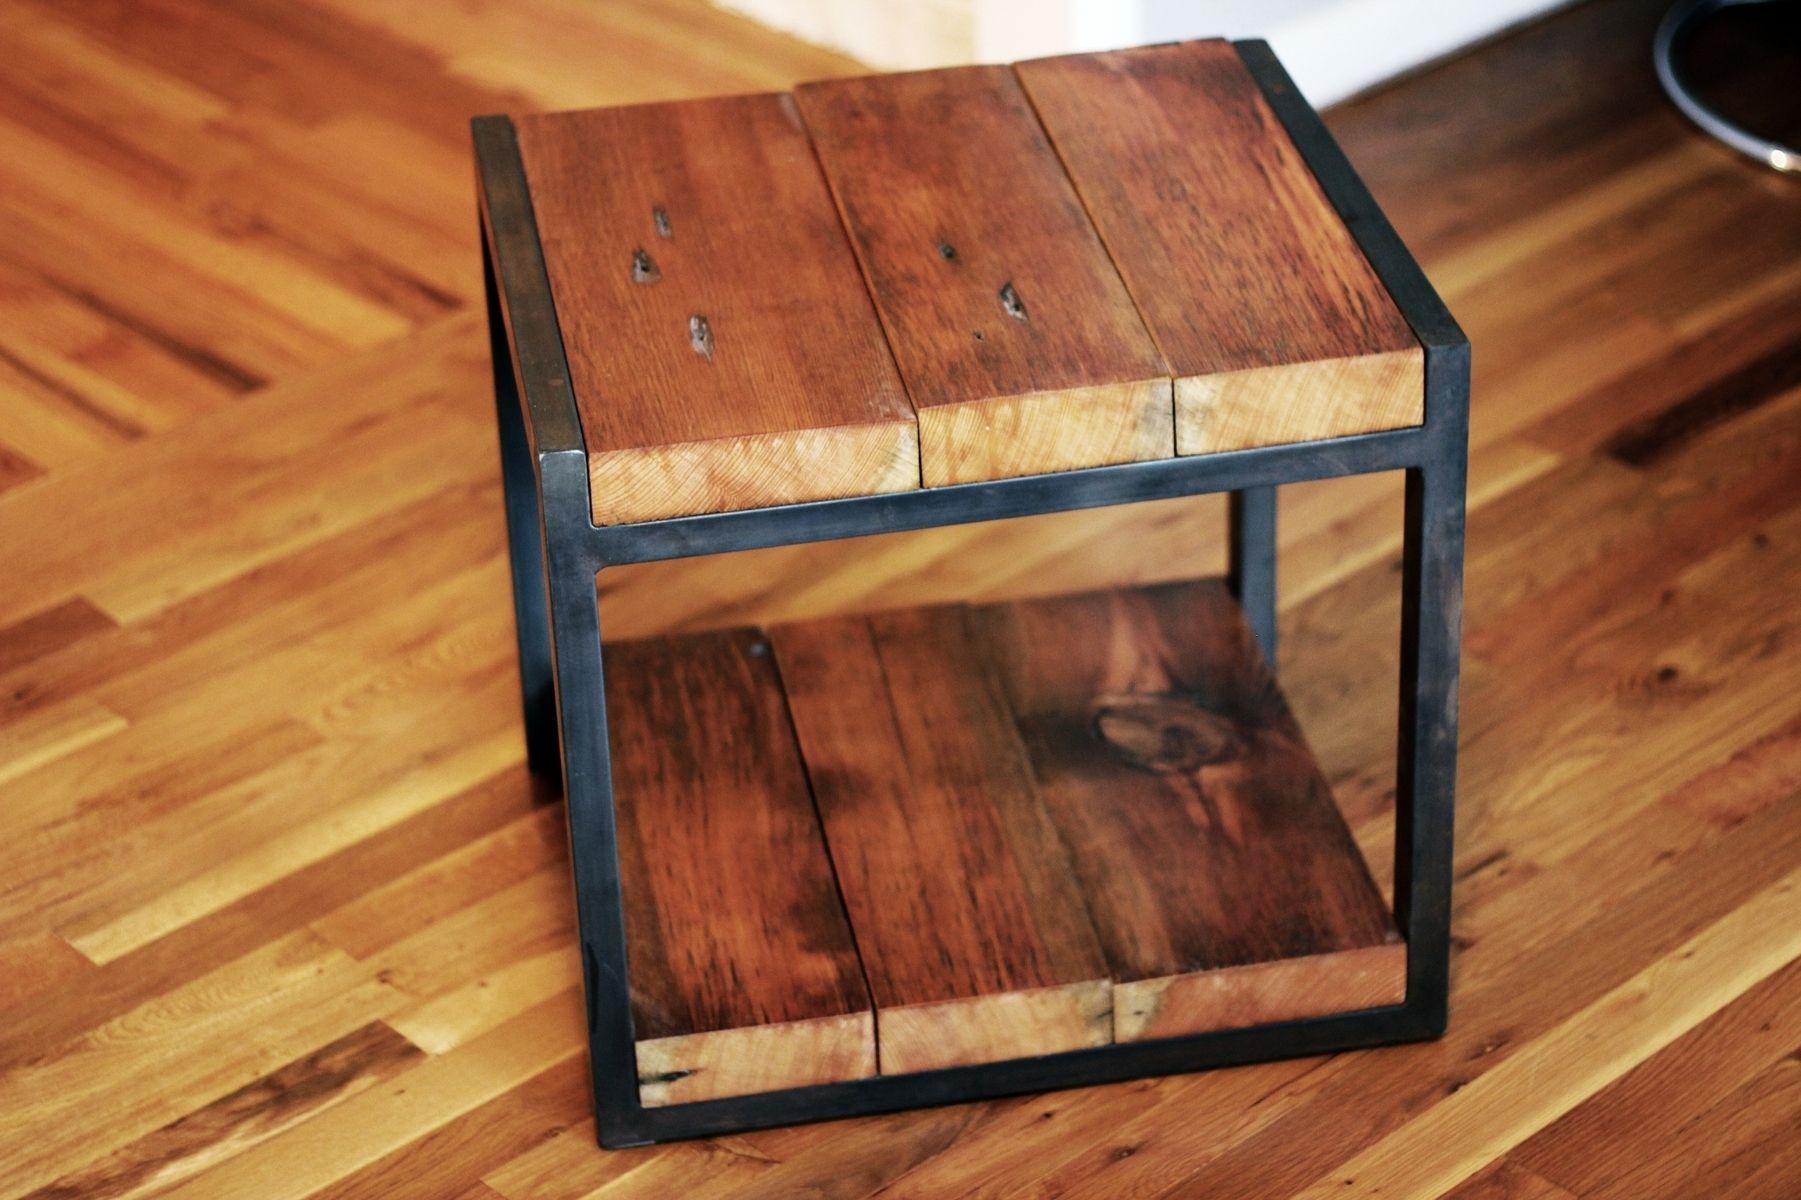 Custom Reclaimed Wood, Steel Side Table by Barreto Studios